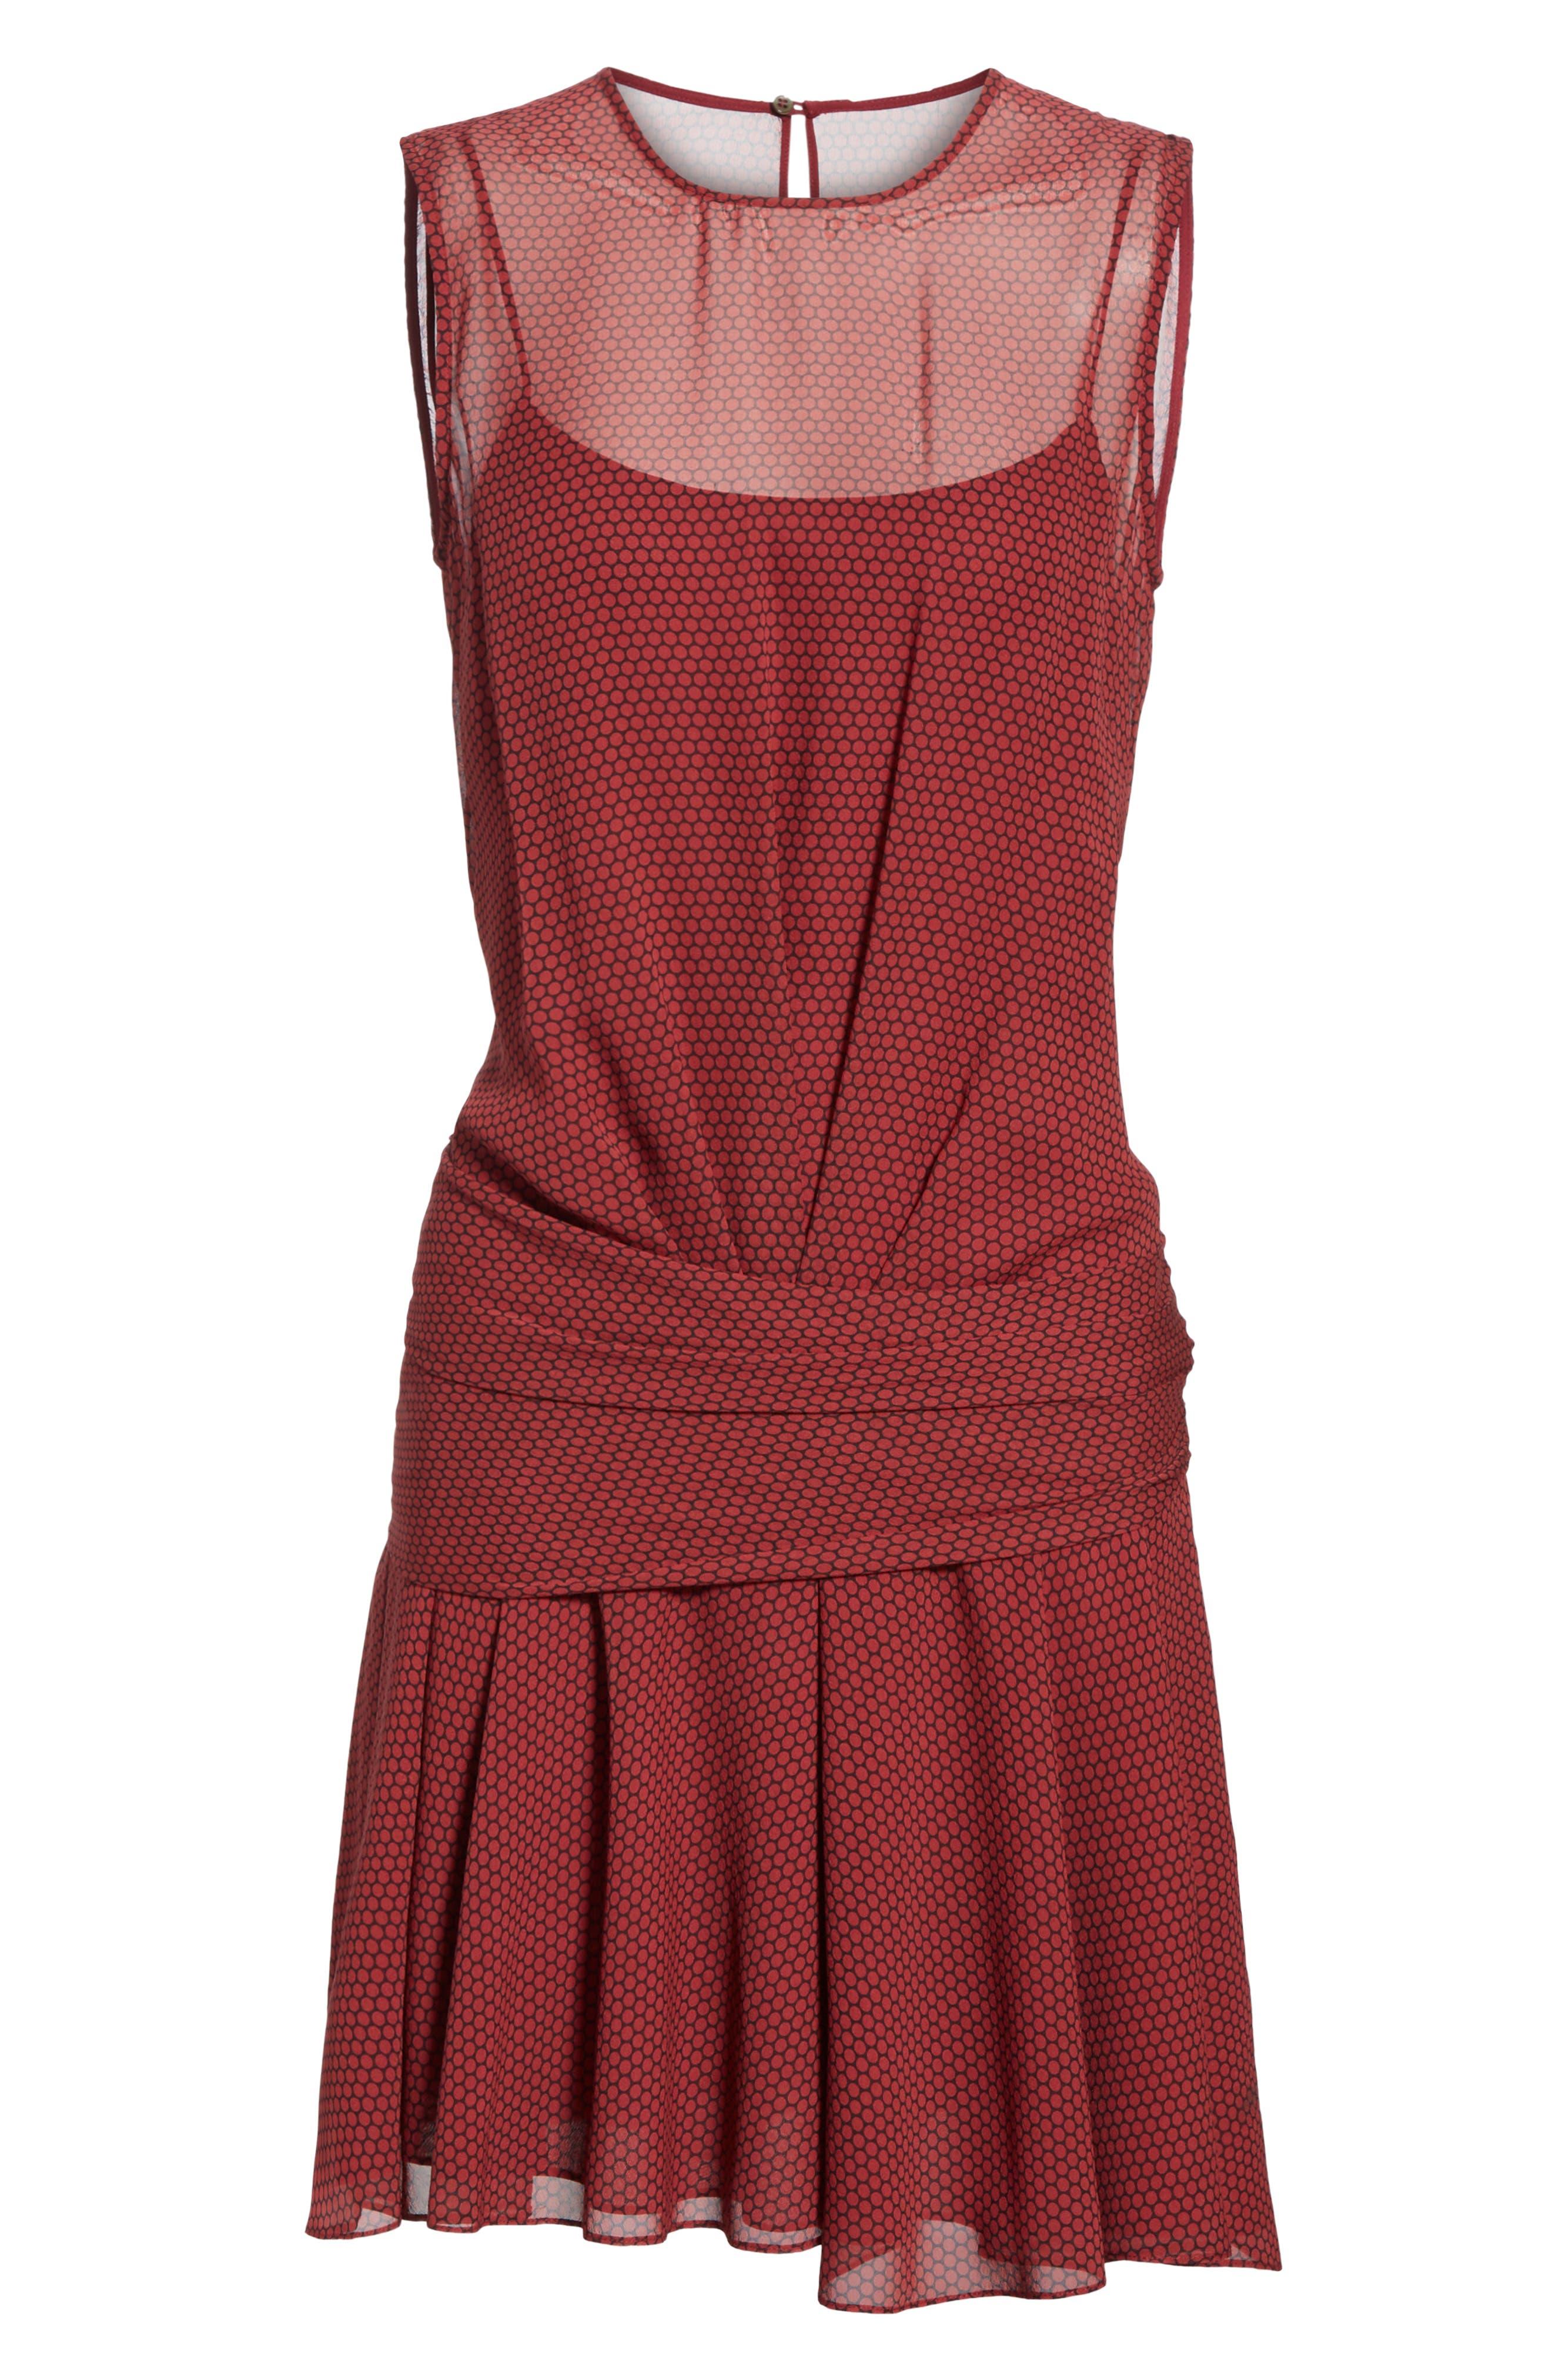 Dot Print Flounce Silk Dress,                             Alternate thumbnail 6, color,                             930